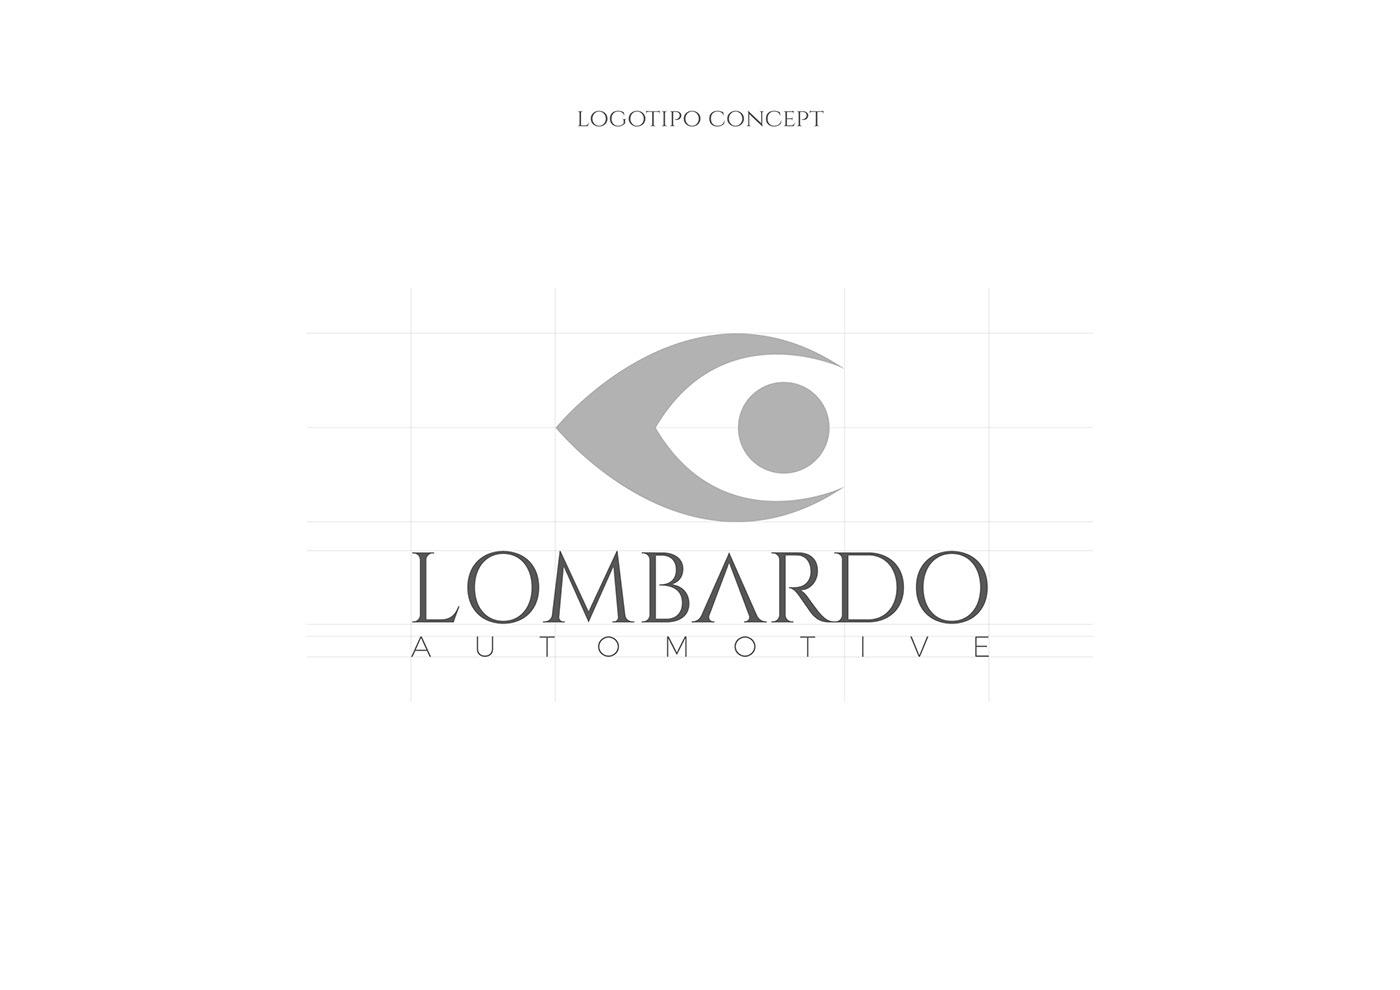 brand Logotipo automotive   Corporate Identity design Creative Direction